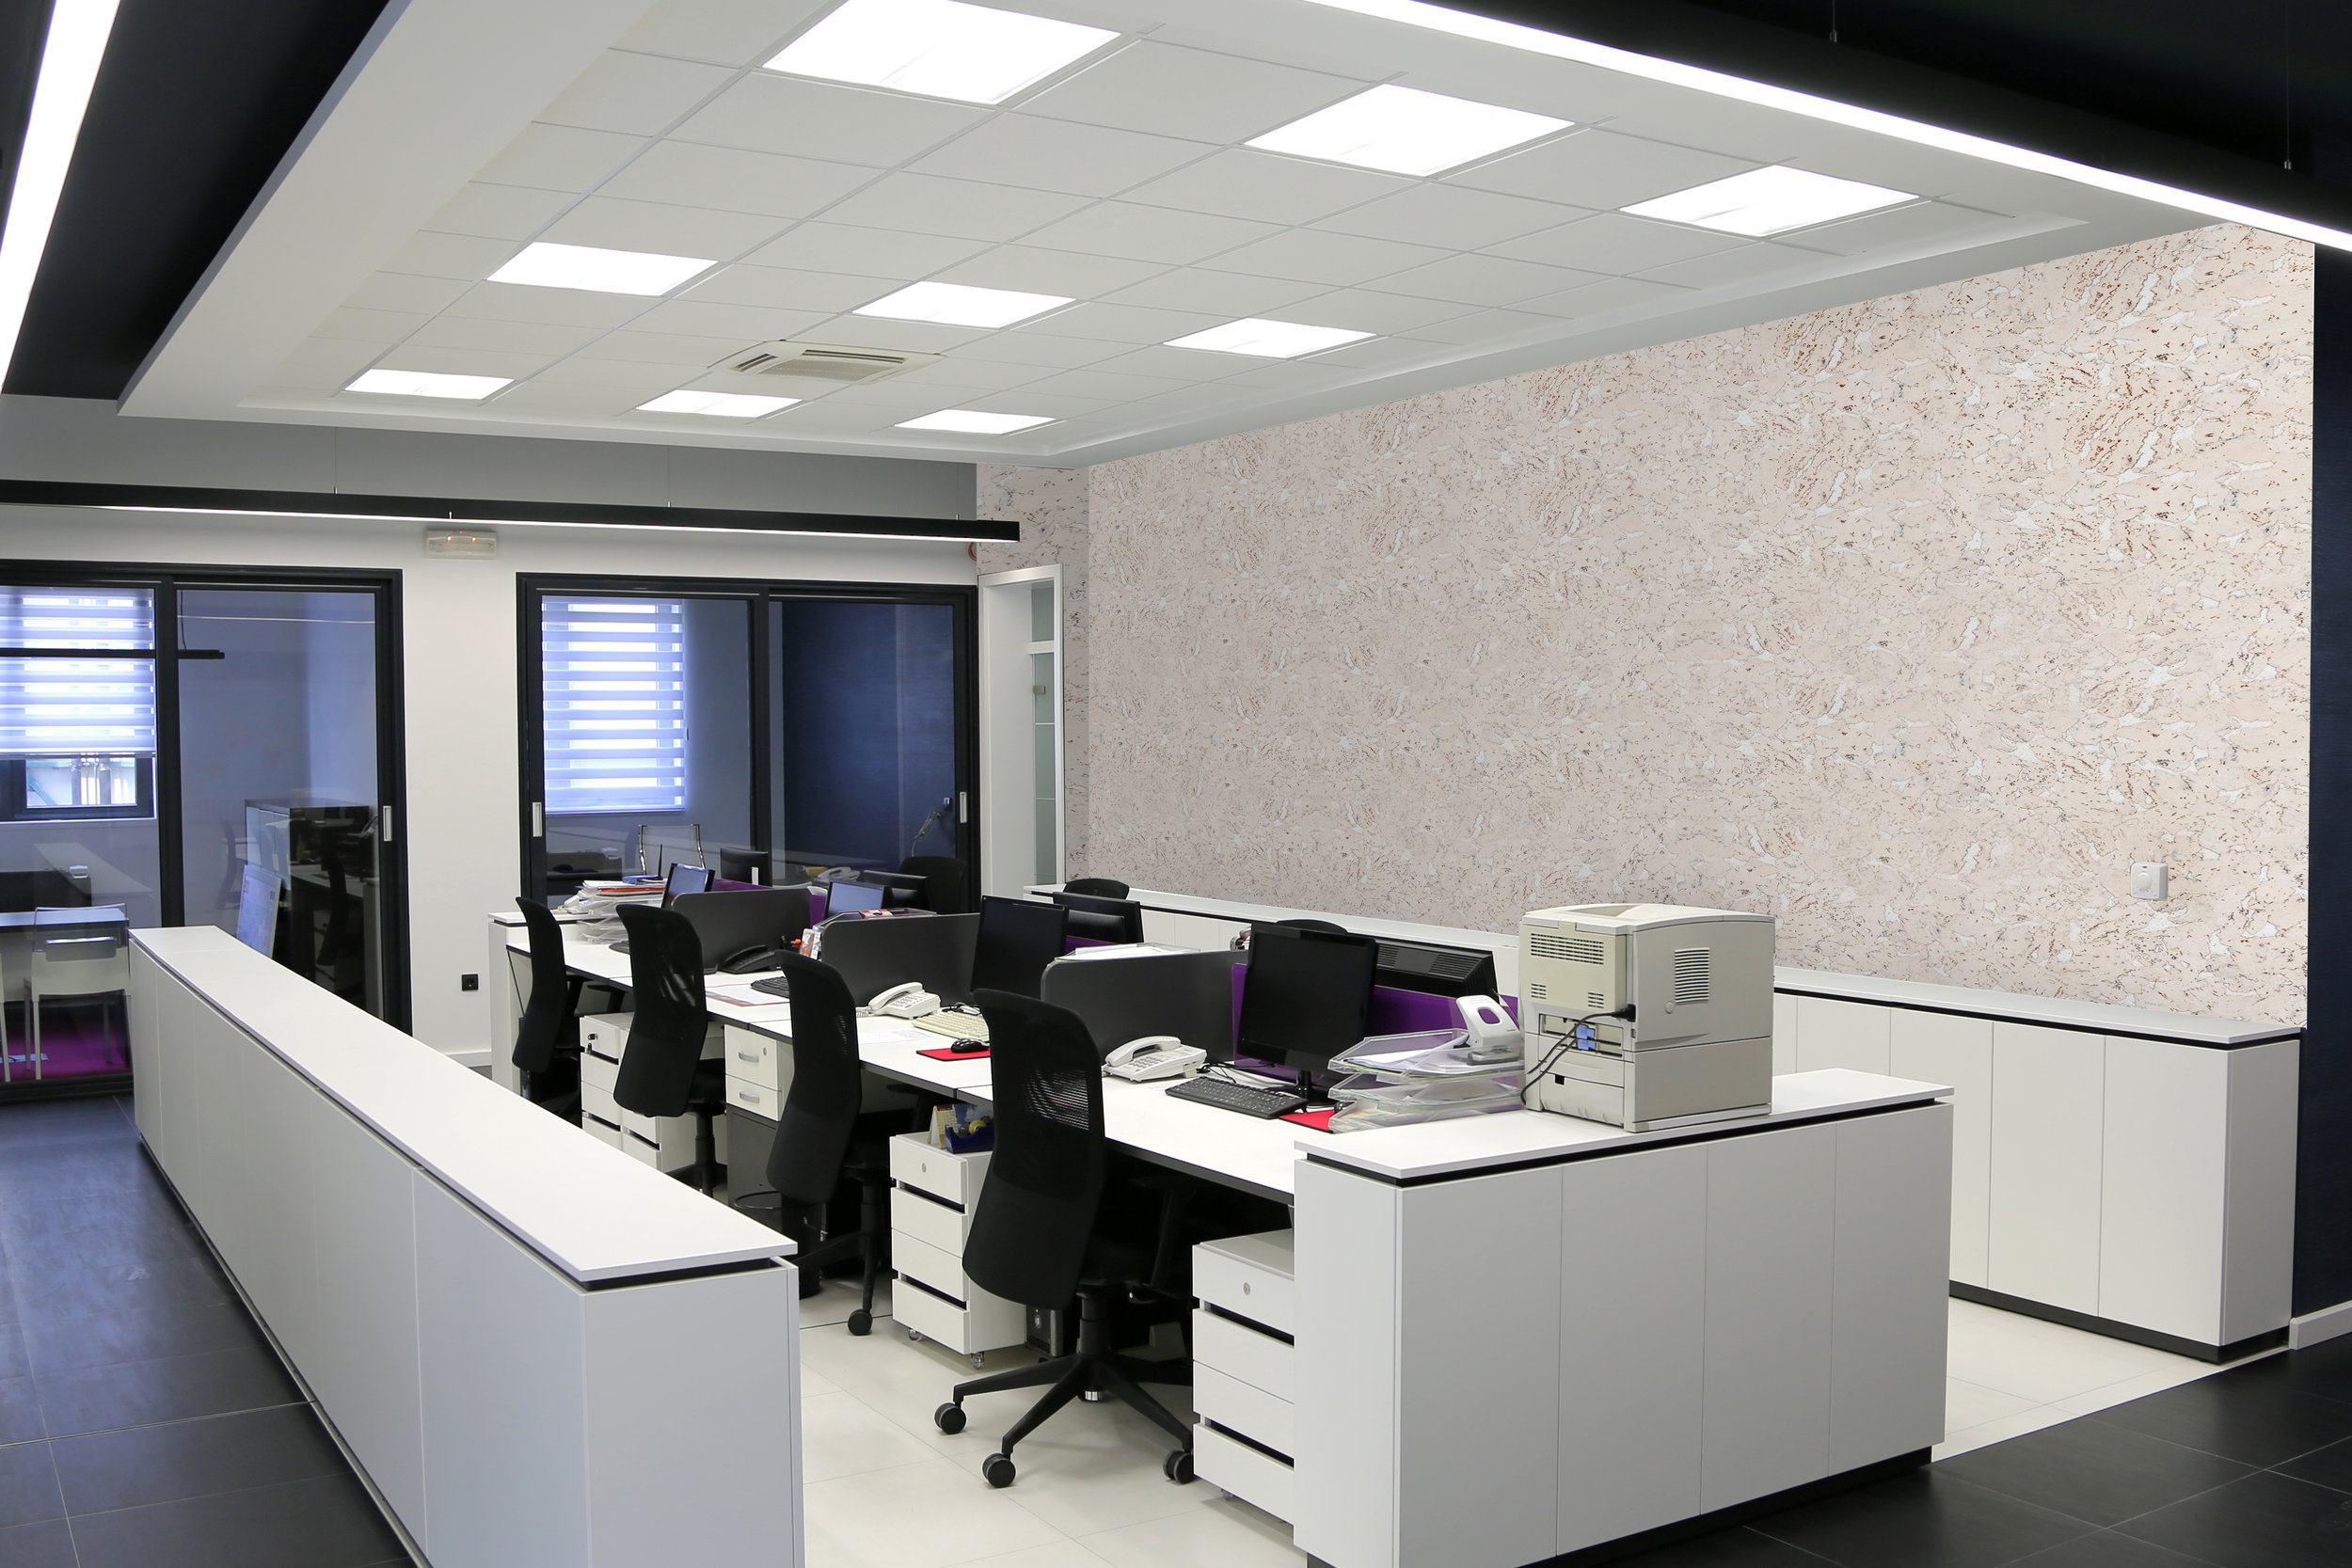 jelinek-cork-wall-marble-white.jpg